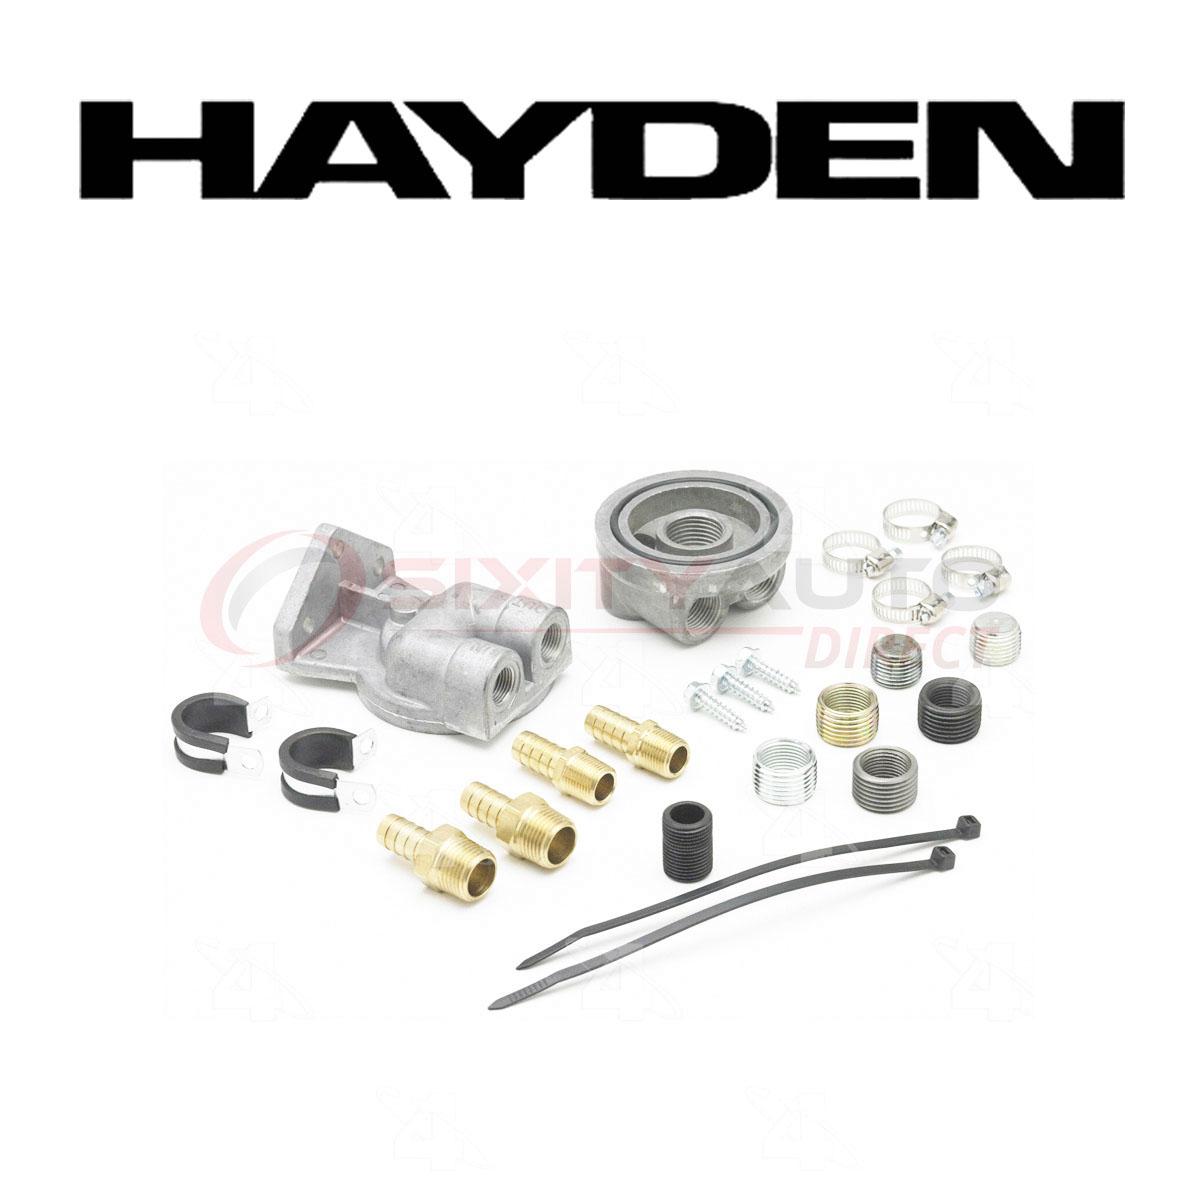 Hayden Oil Filter Remote Mounting Kit for 2003 Nissan